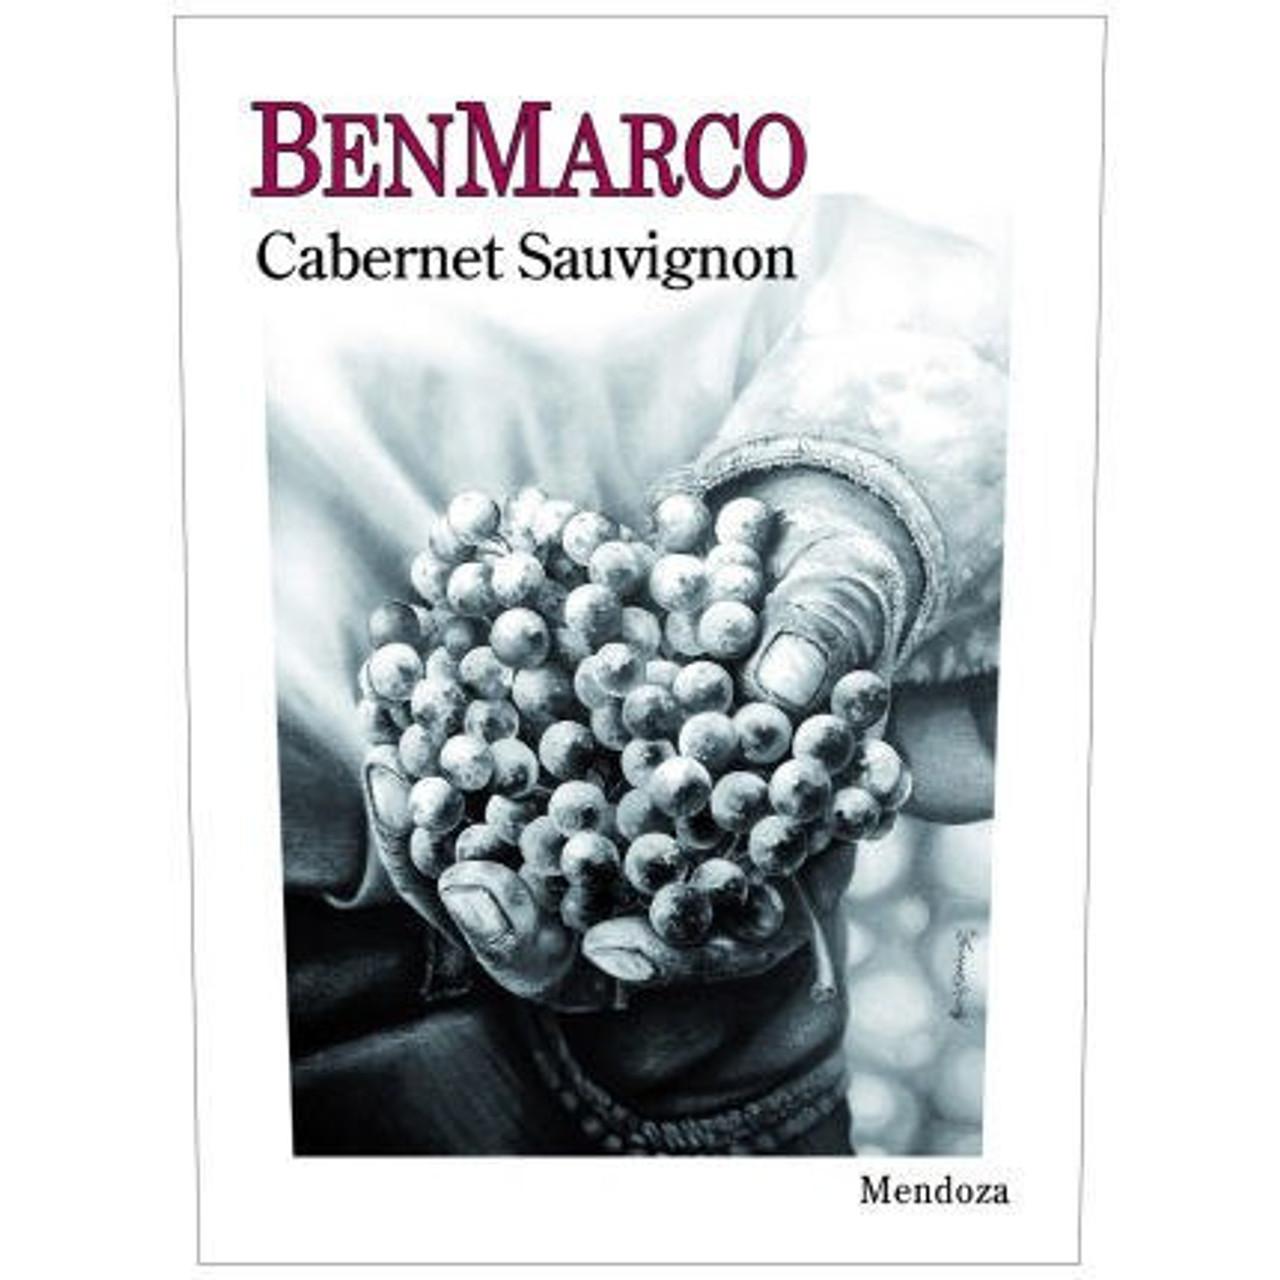 BenMarco Mendoza Cabernet 2013 (Argentina)